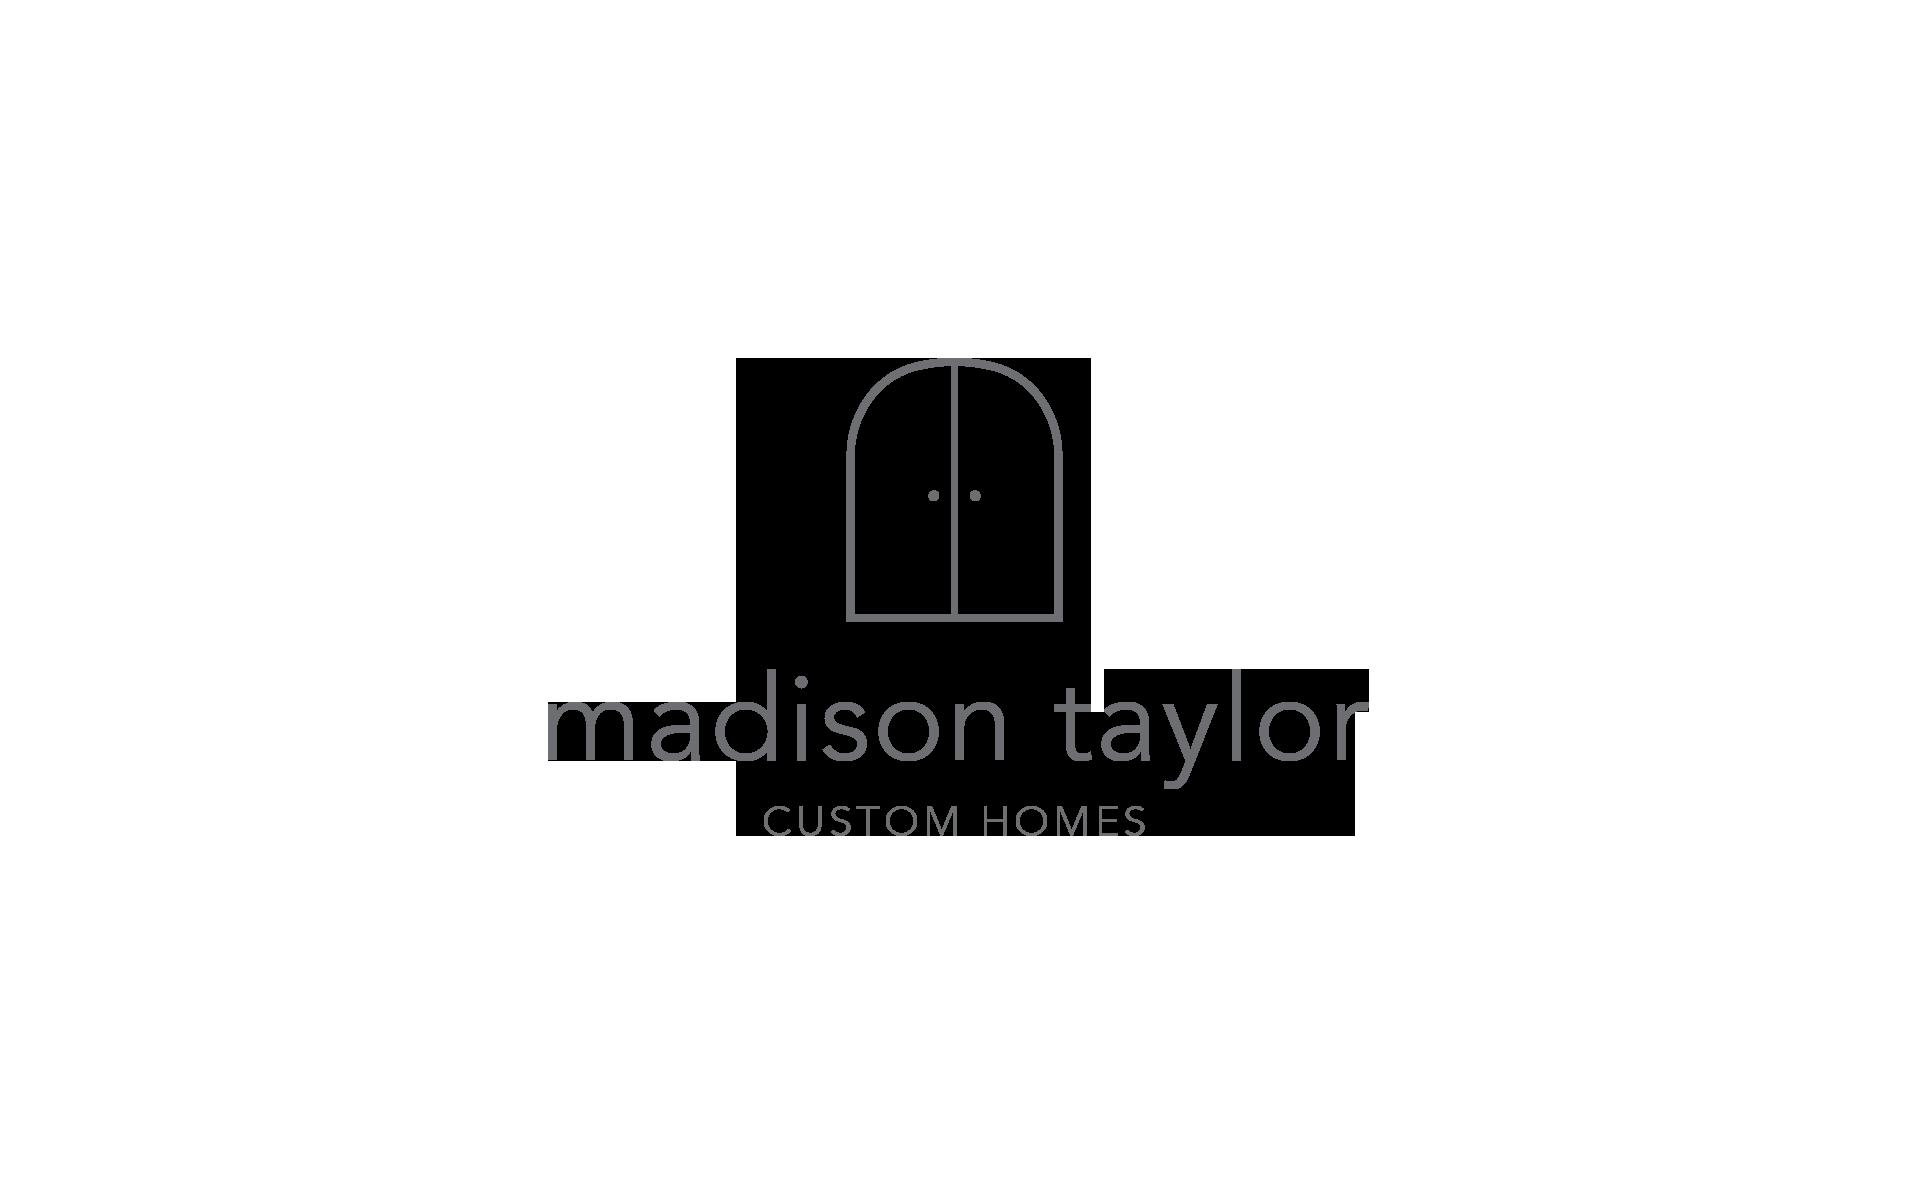 Madison Taylor Logo 2